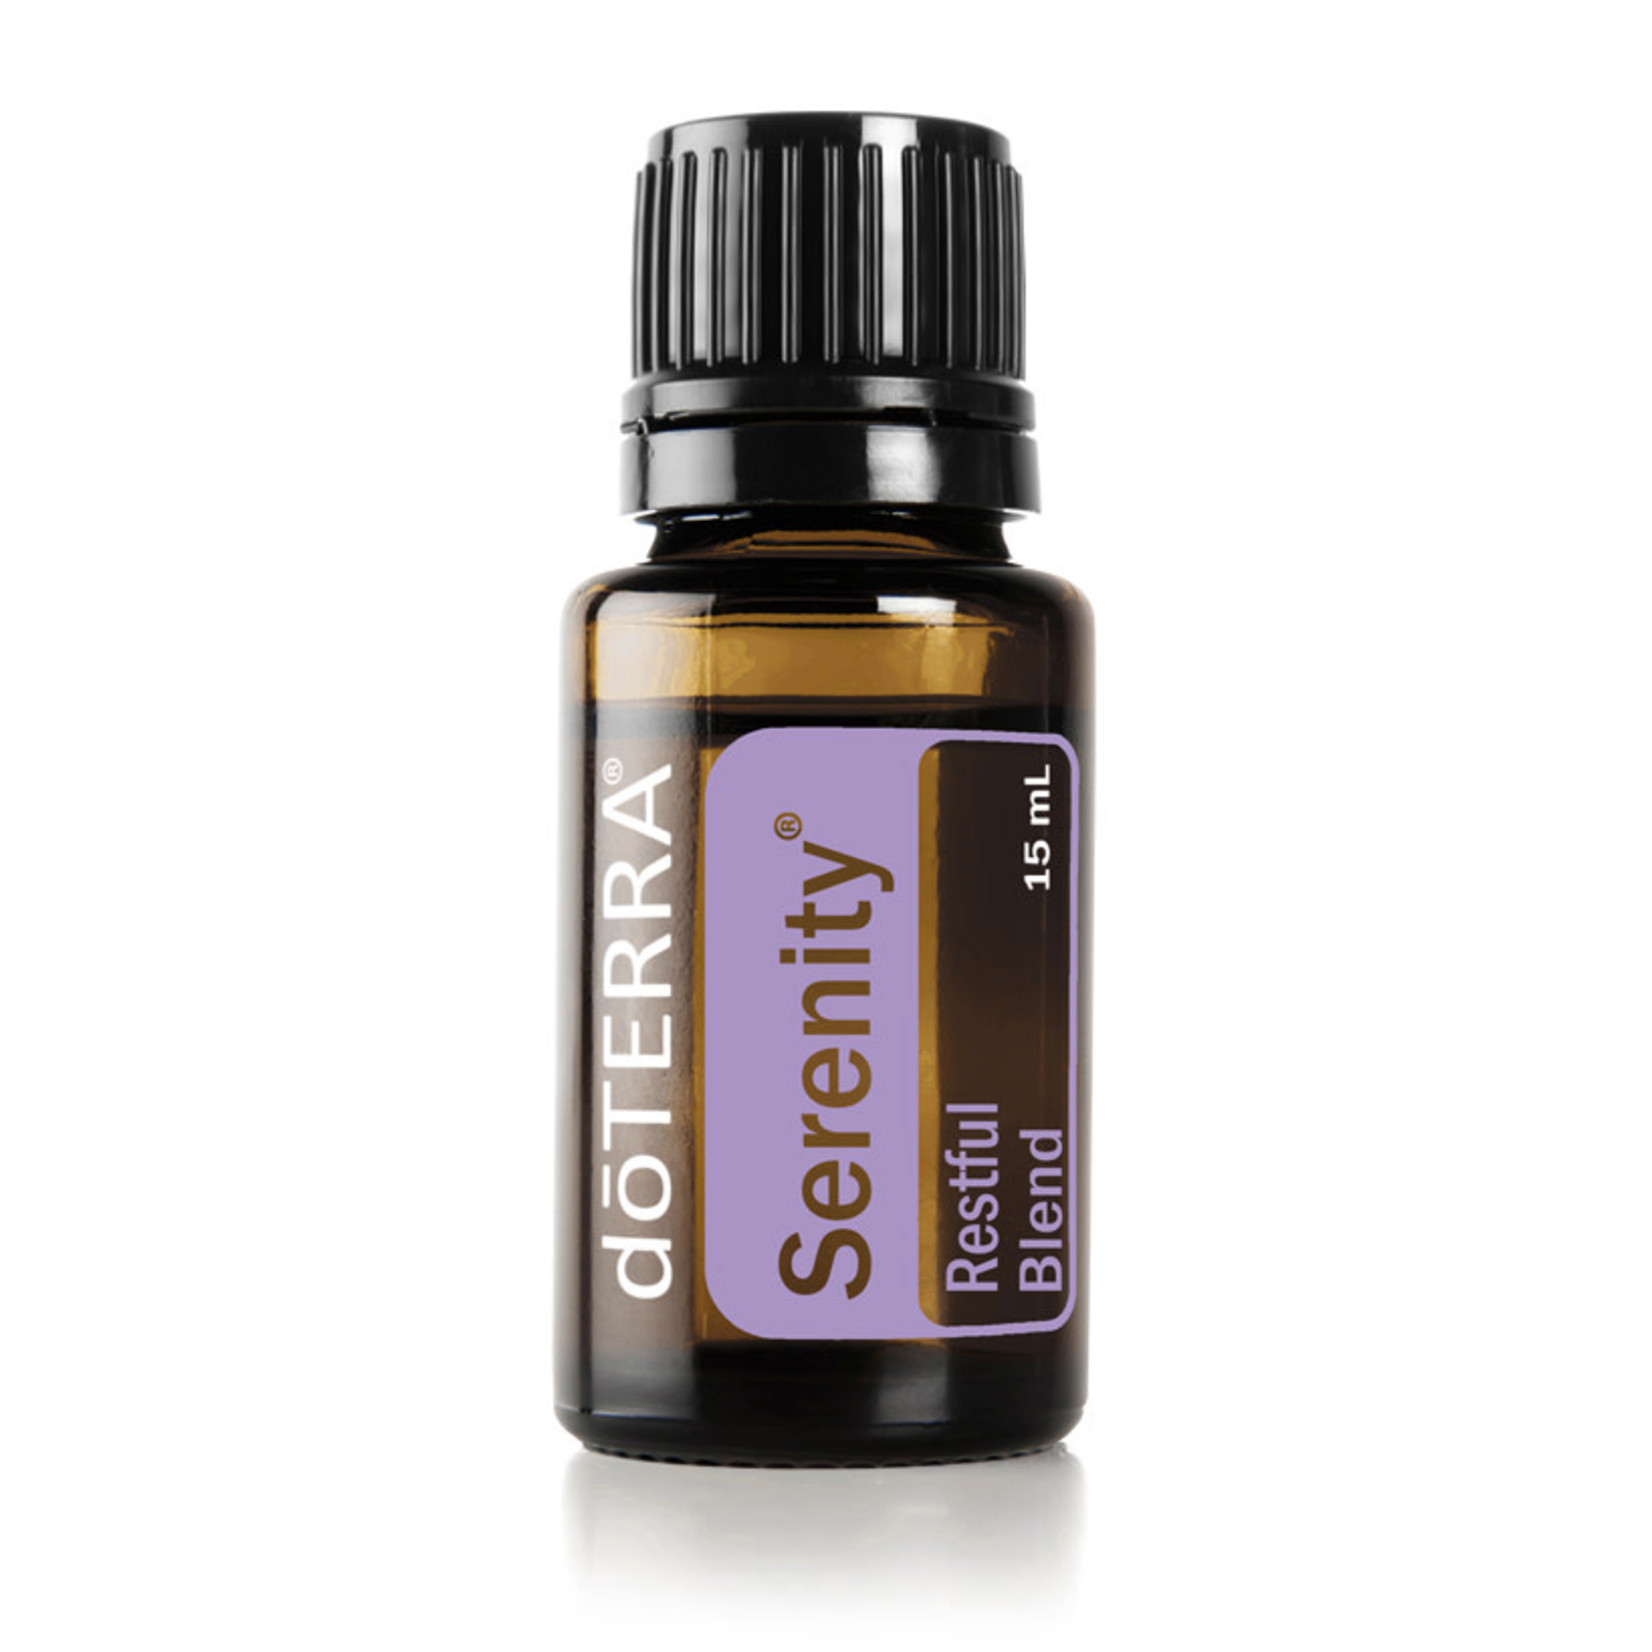 doTERRA doTERRA Essential Oil Serenity 15ml